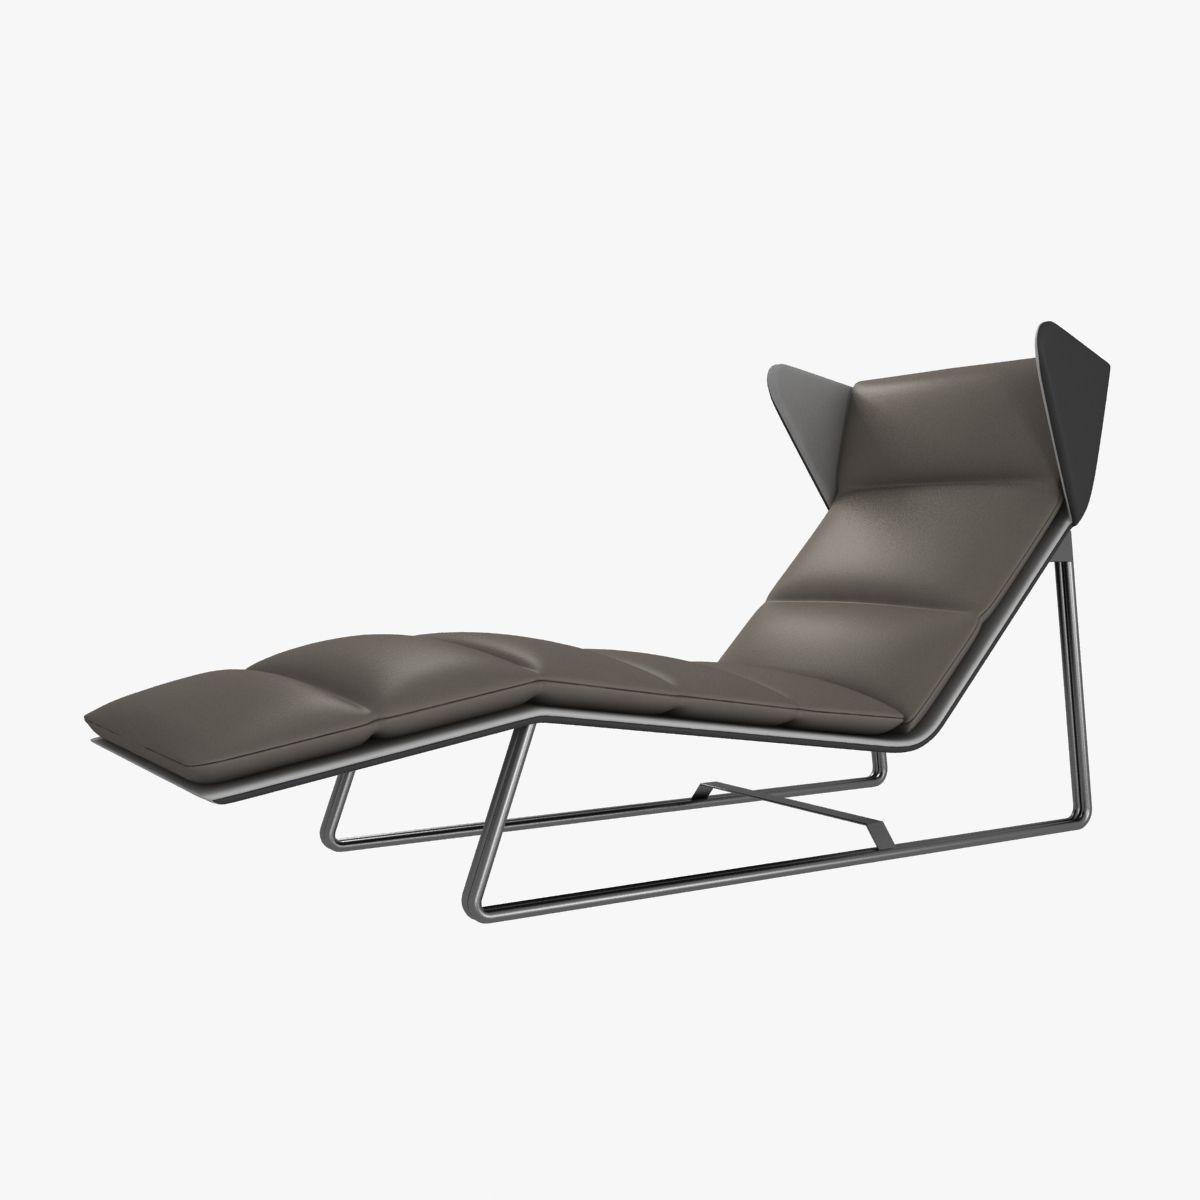 esedra romea modern chaise lounge d model max obj ds fbx mtl  . esedra romea modern chaise lounge d model  cgtrader